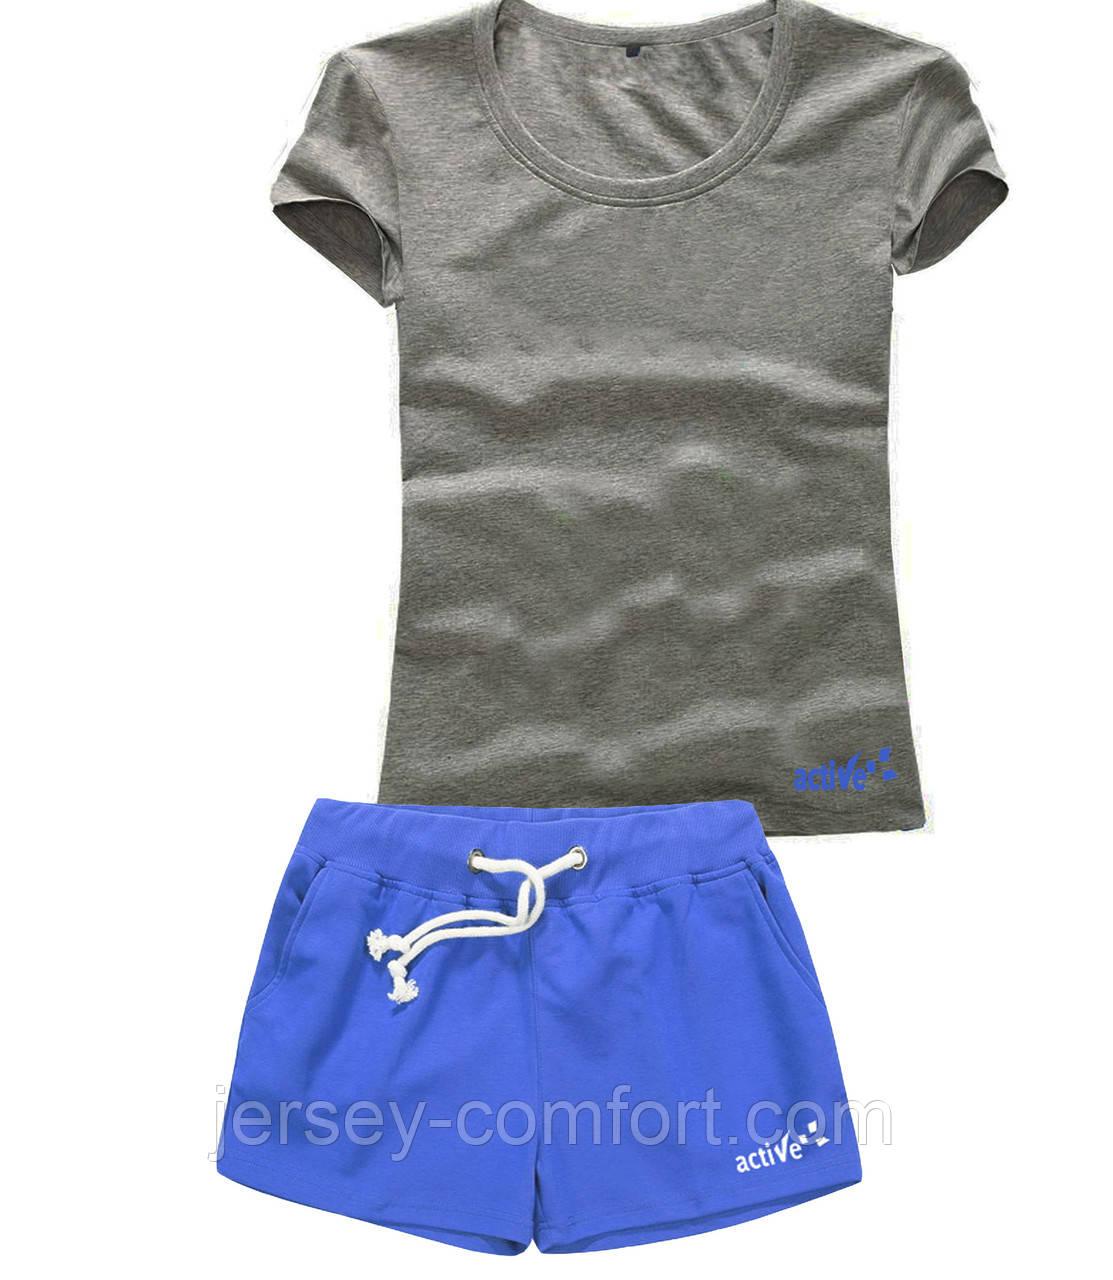 Шорты женские и футболка, комплект. Размеры 40-56.Мод. М-28..